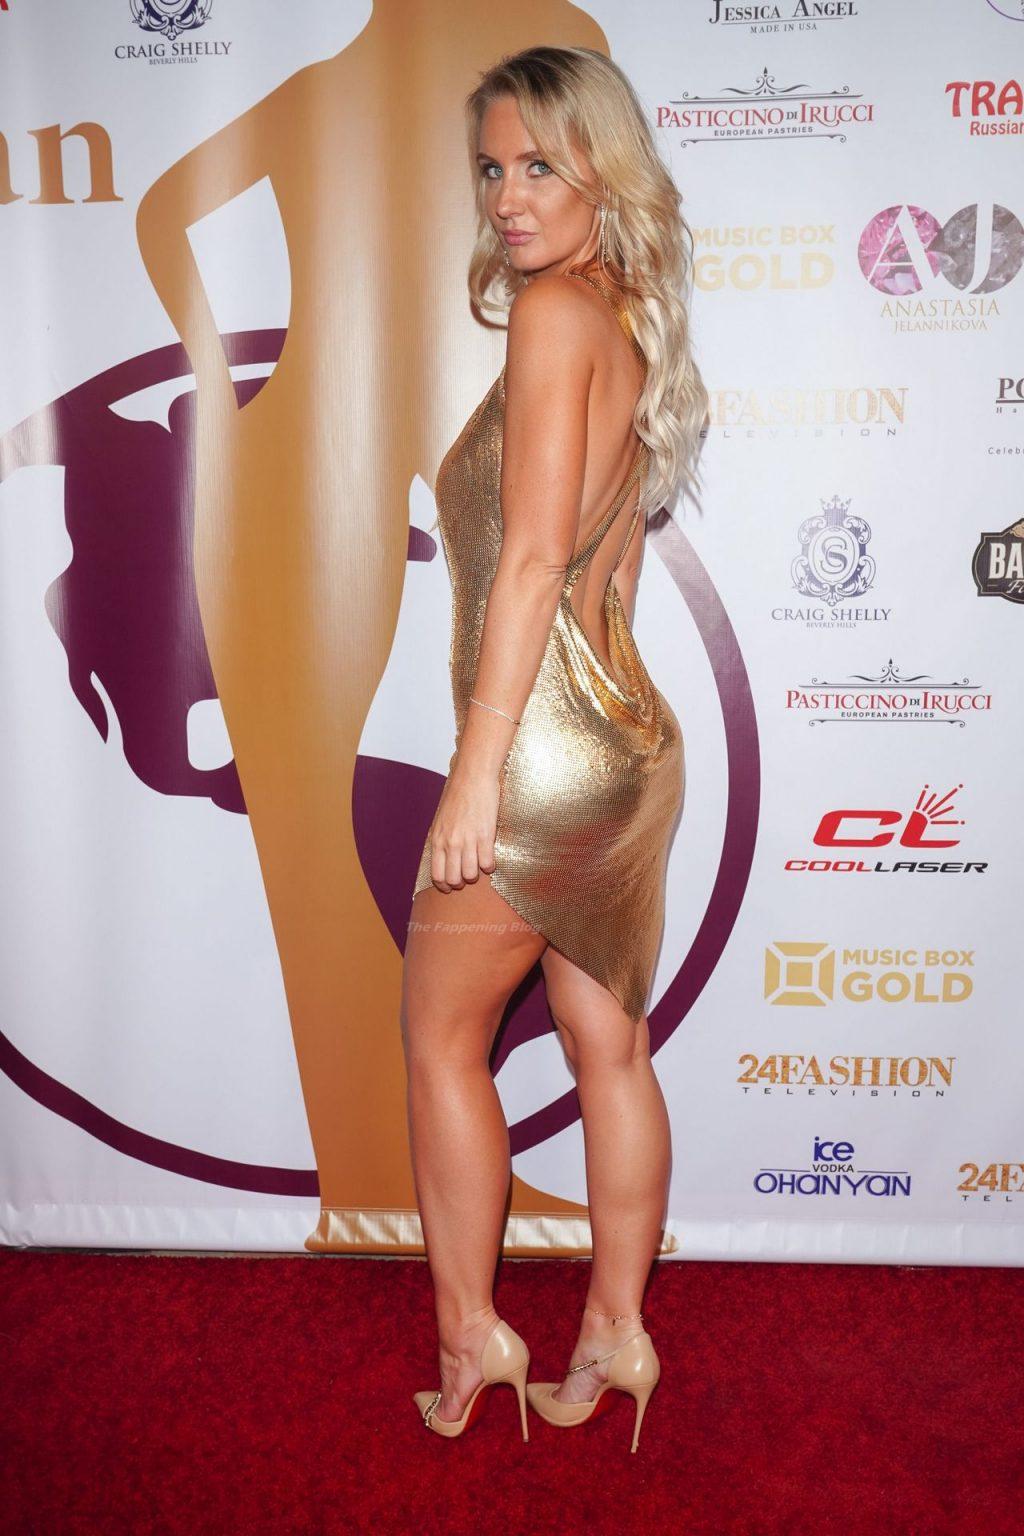 Anya Shevchenko Puts on a Leggy Display in Hollywood (17 Photos)